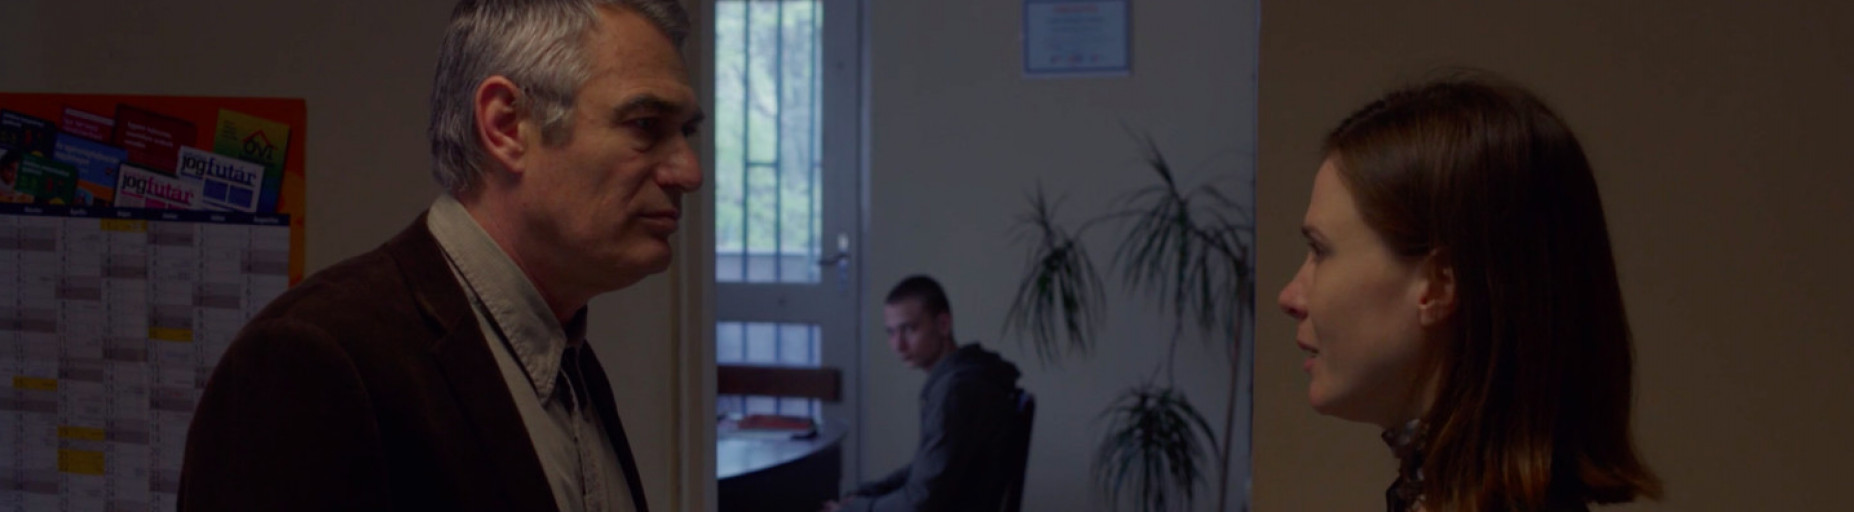 Kölcsey Levente rövidfilmje a locarnói versenyben